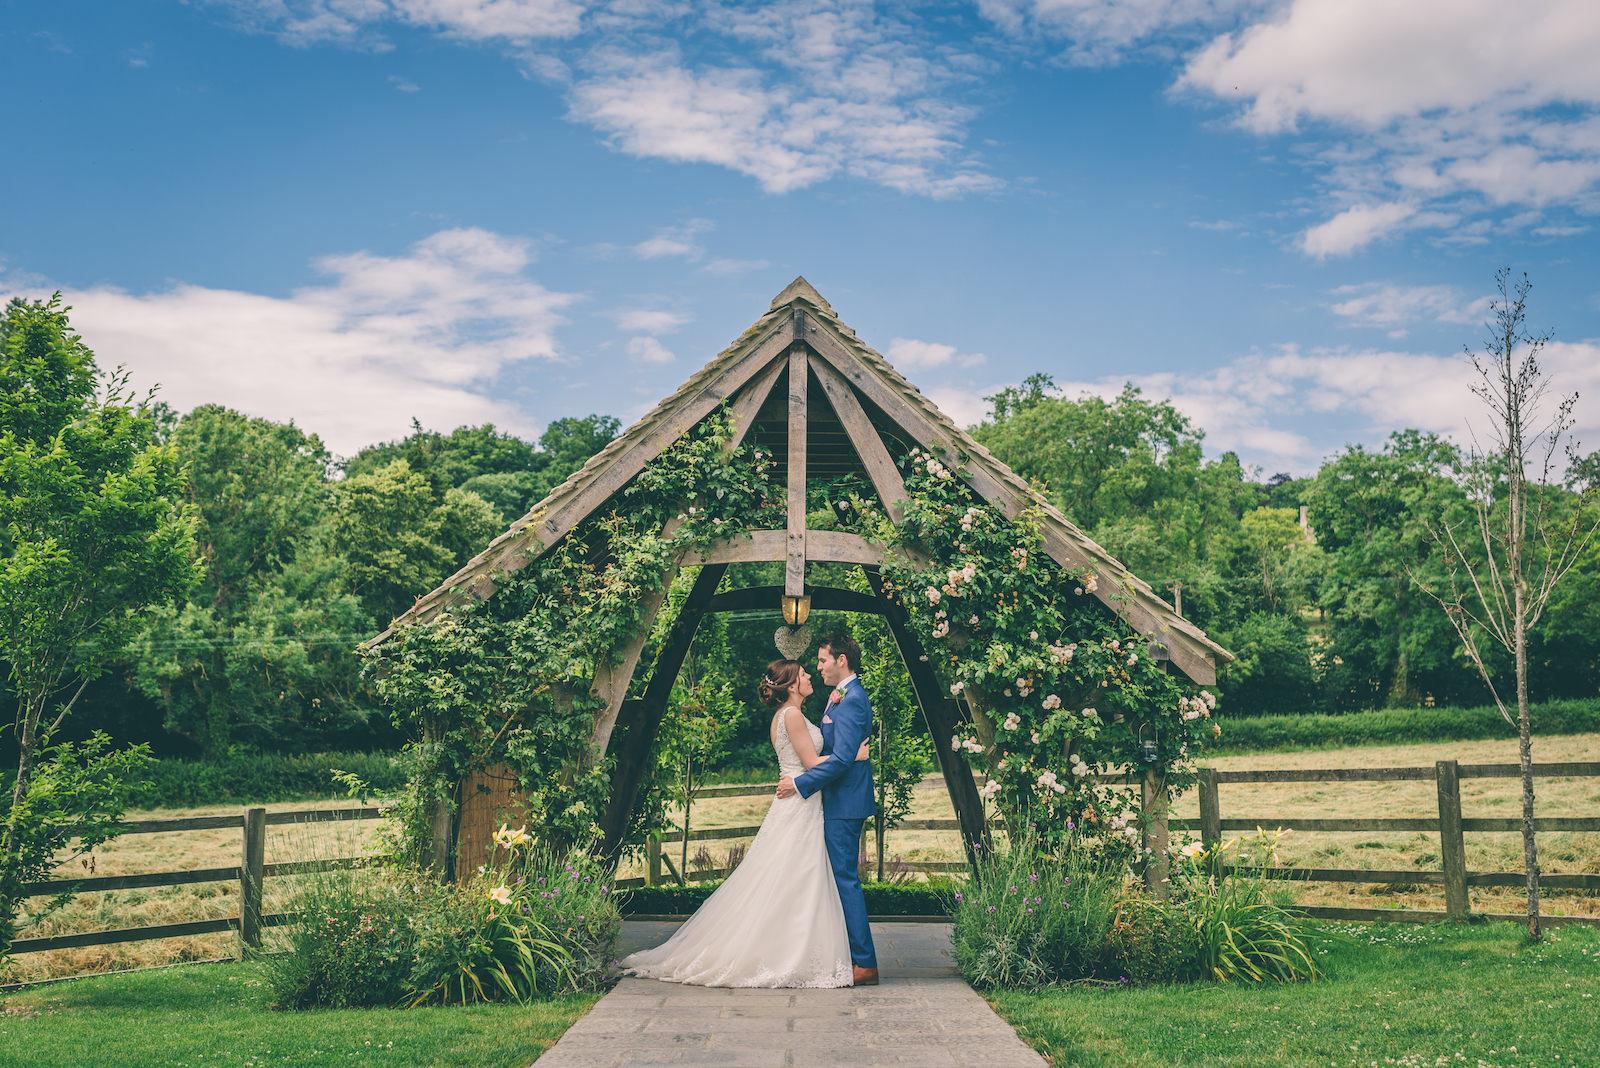 2017 Cotswold Wedding Review – Part Ten